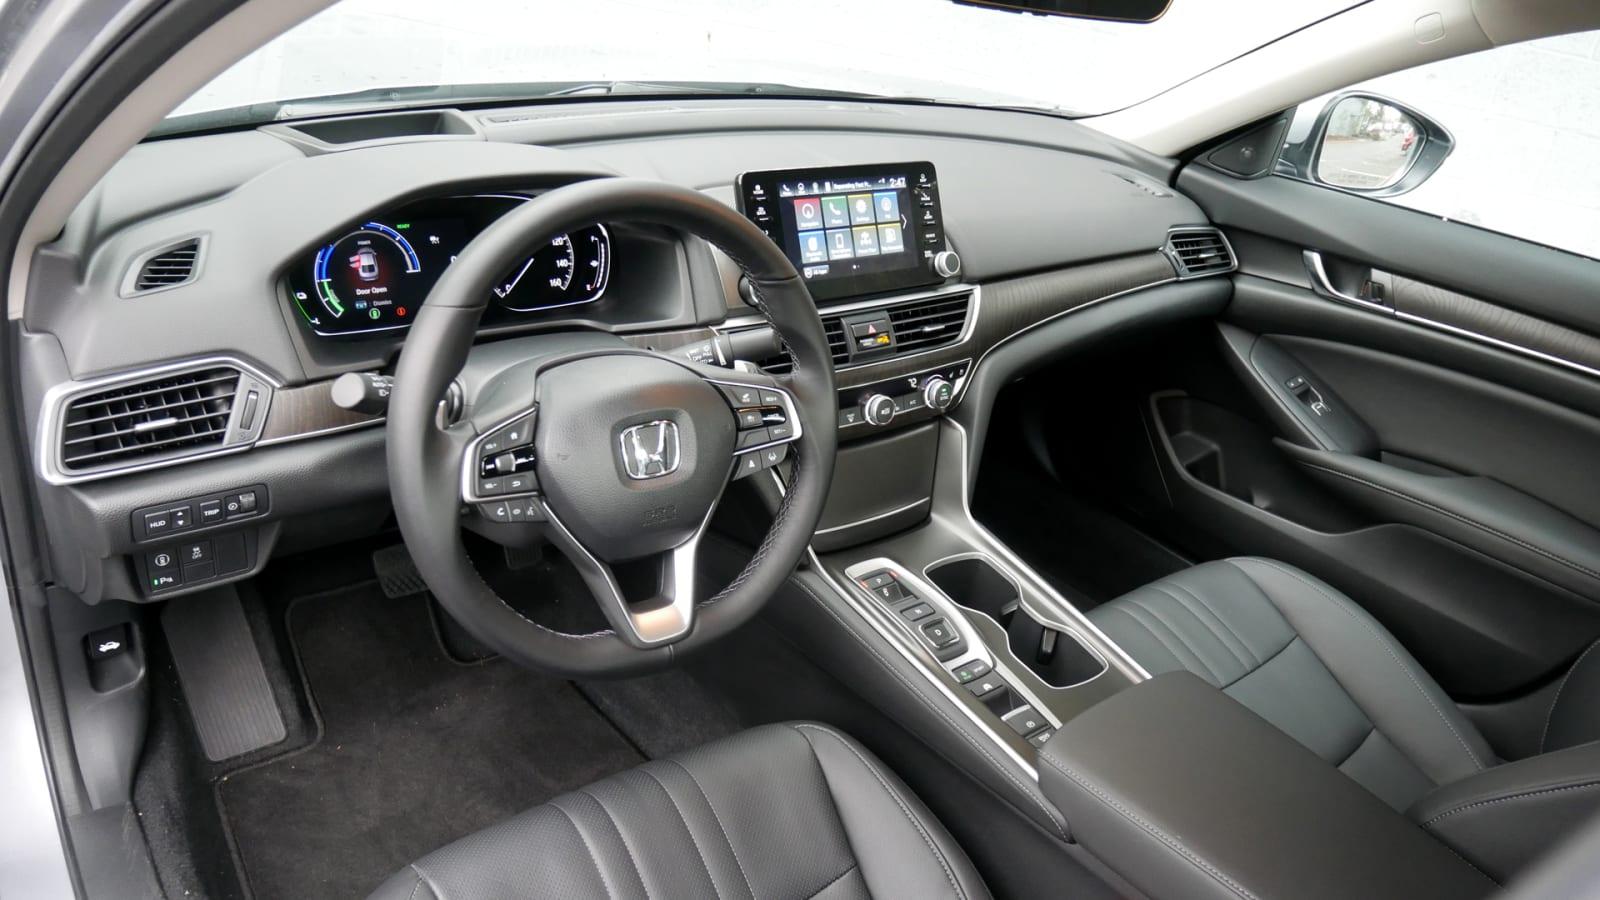 2021 Honda Accord Hybrid Interior from driver